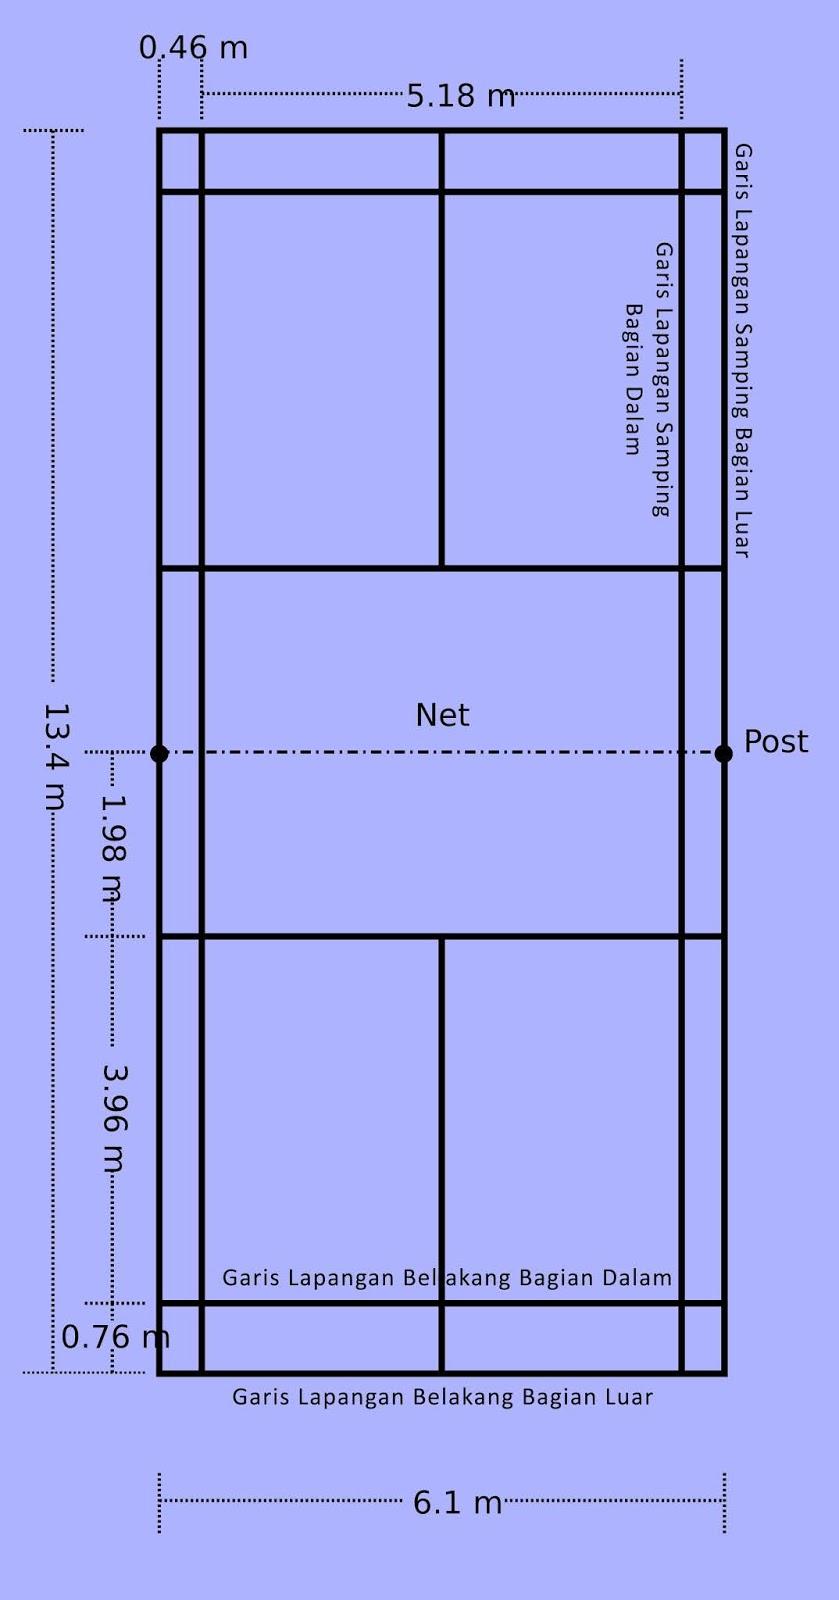 Gambar Lapangan Batminton : gambar, lapangan, batminton, Ukuran, Lapangan, Badminton, Lengkap, Gambar, Keterangannya, MARKIJAR.Com